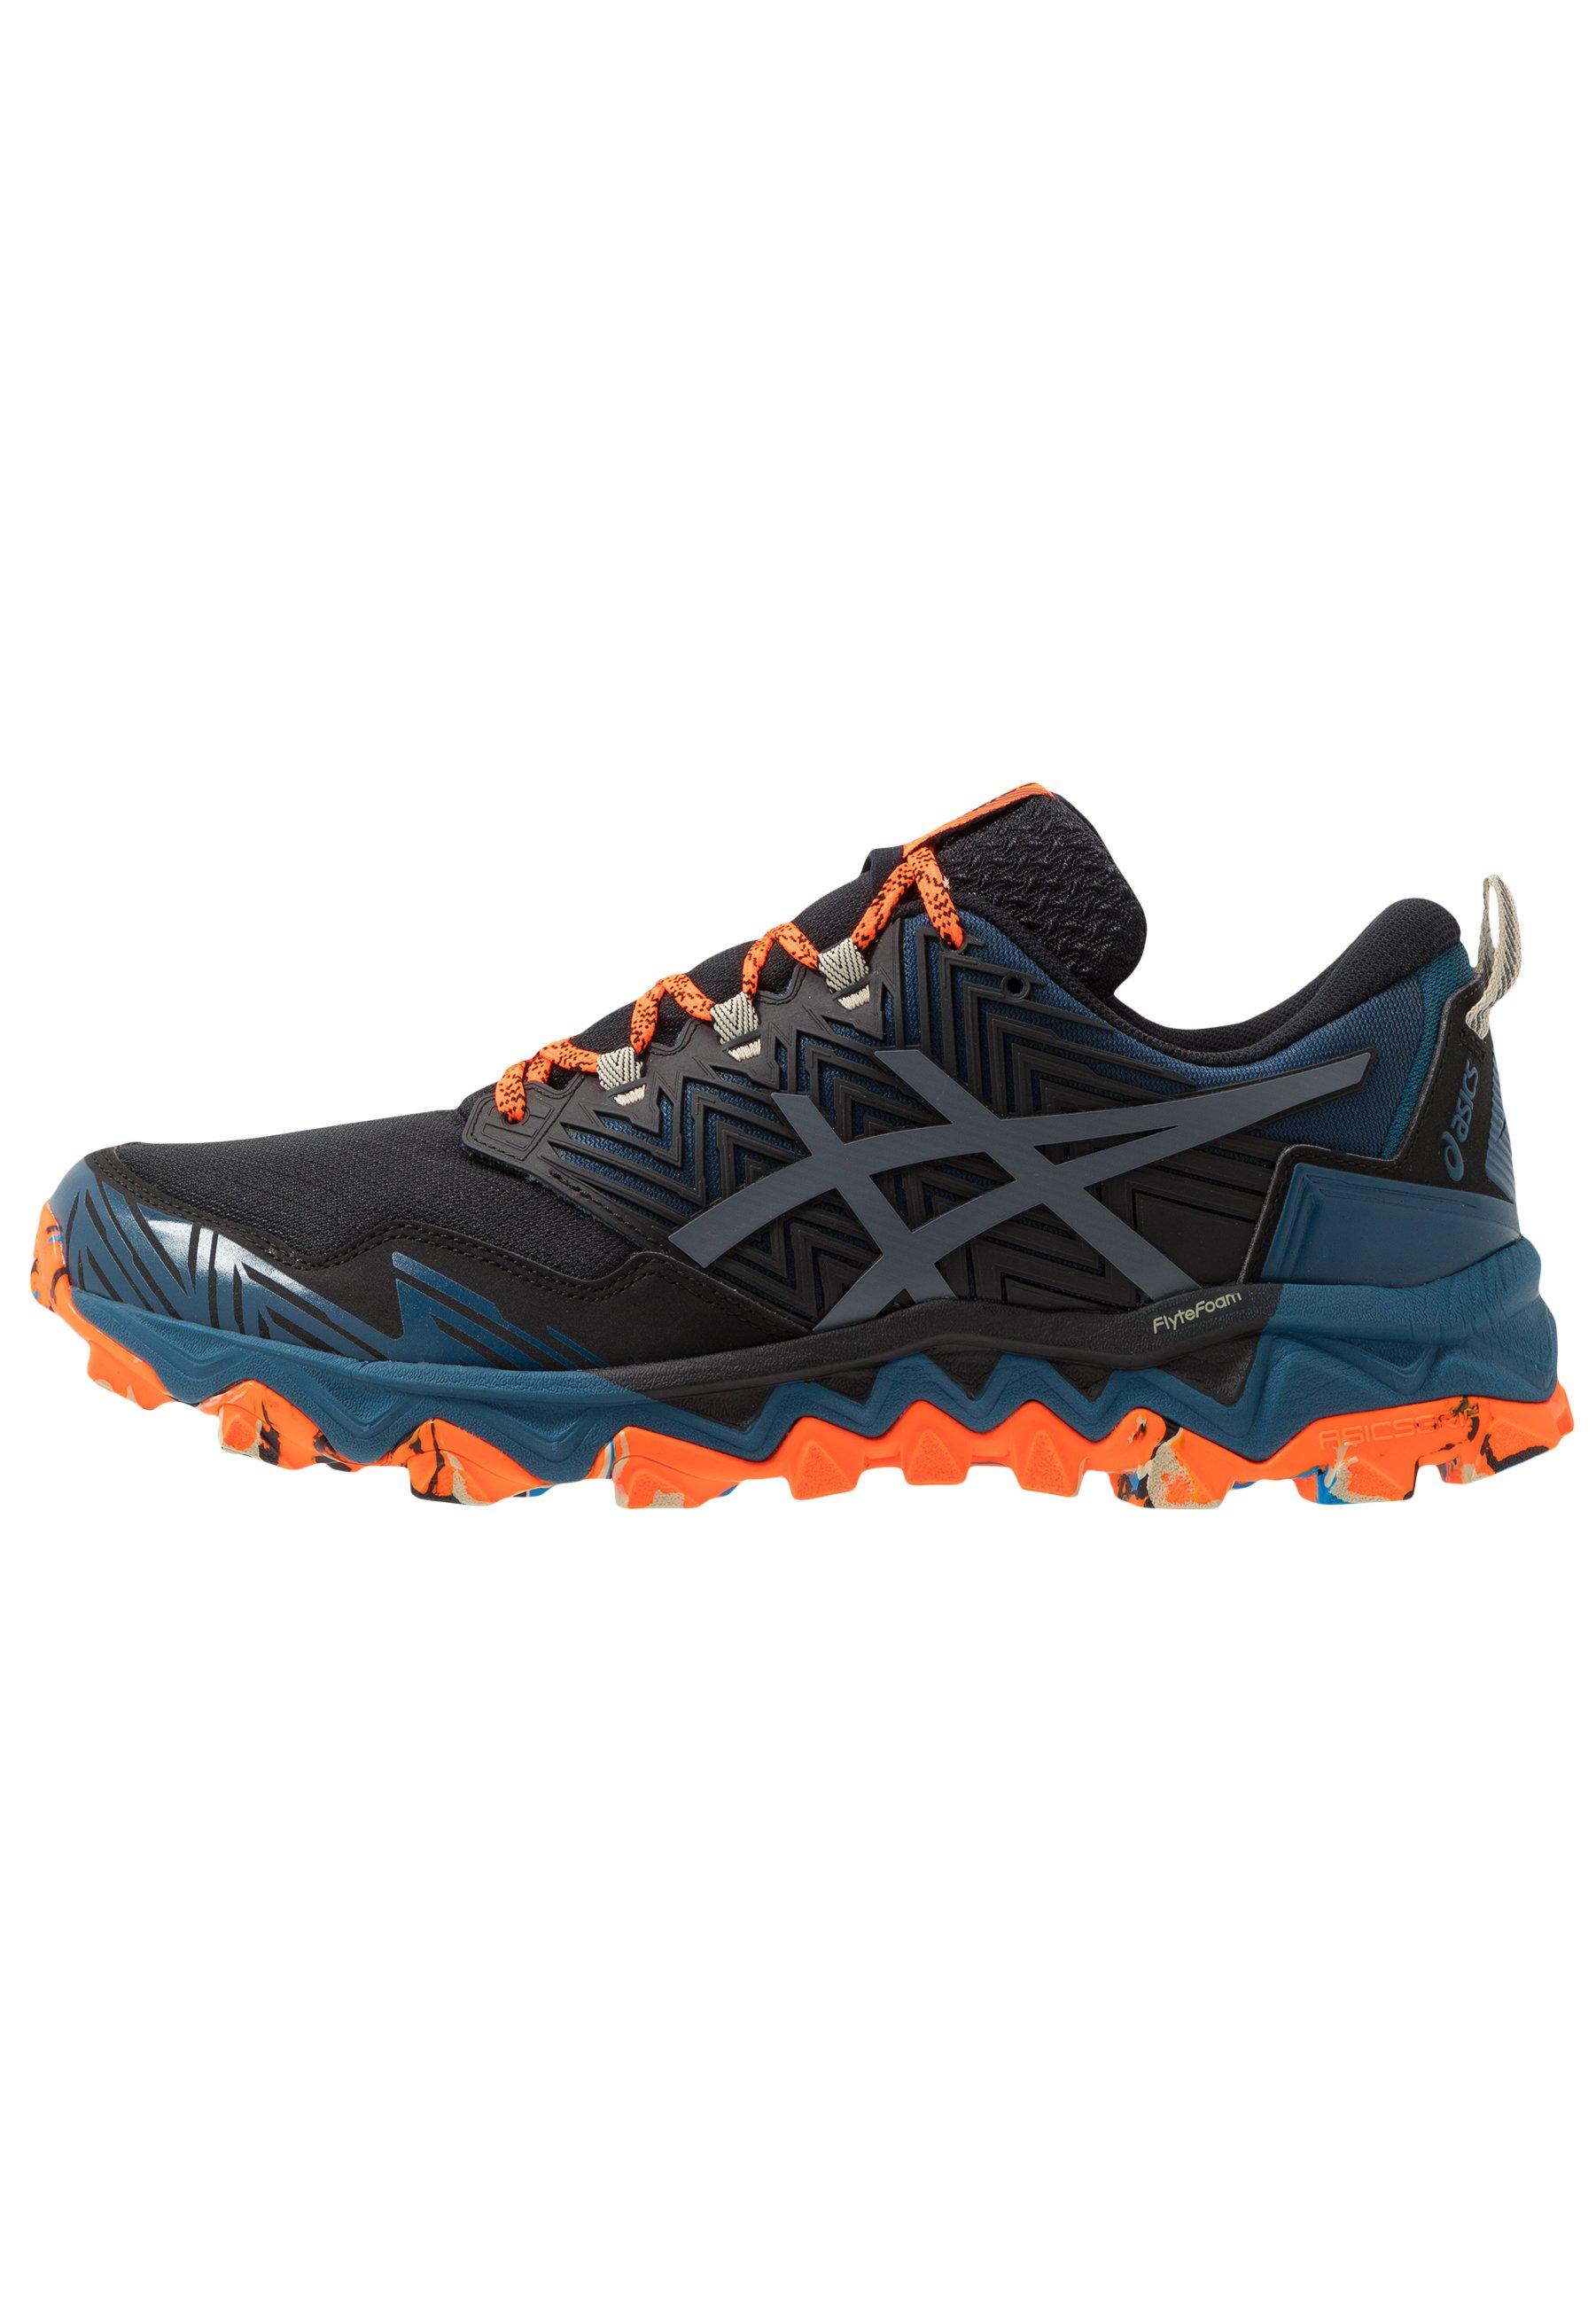 Asics Herren Fujitrabuco Pro Trail Turnschuhe Laufschuhe Sneaker Schuhe Blau